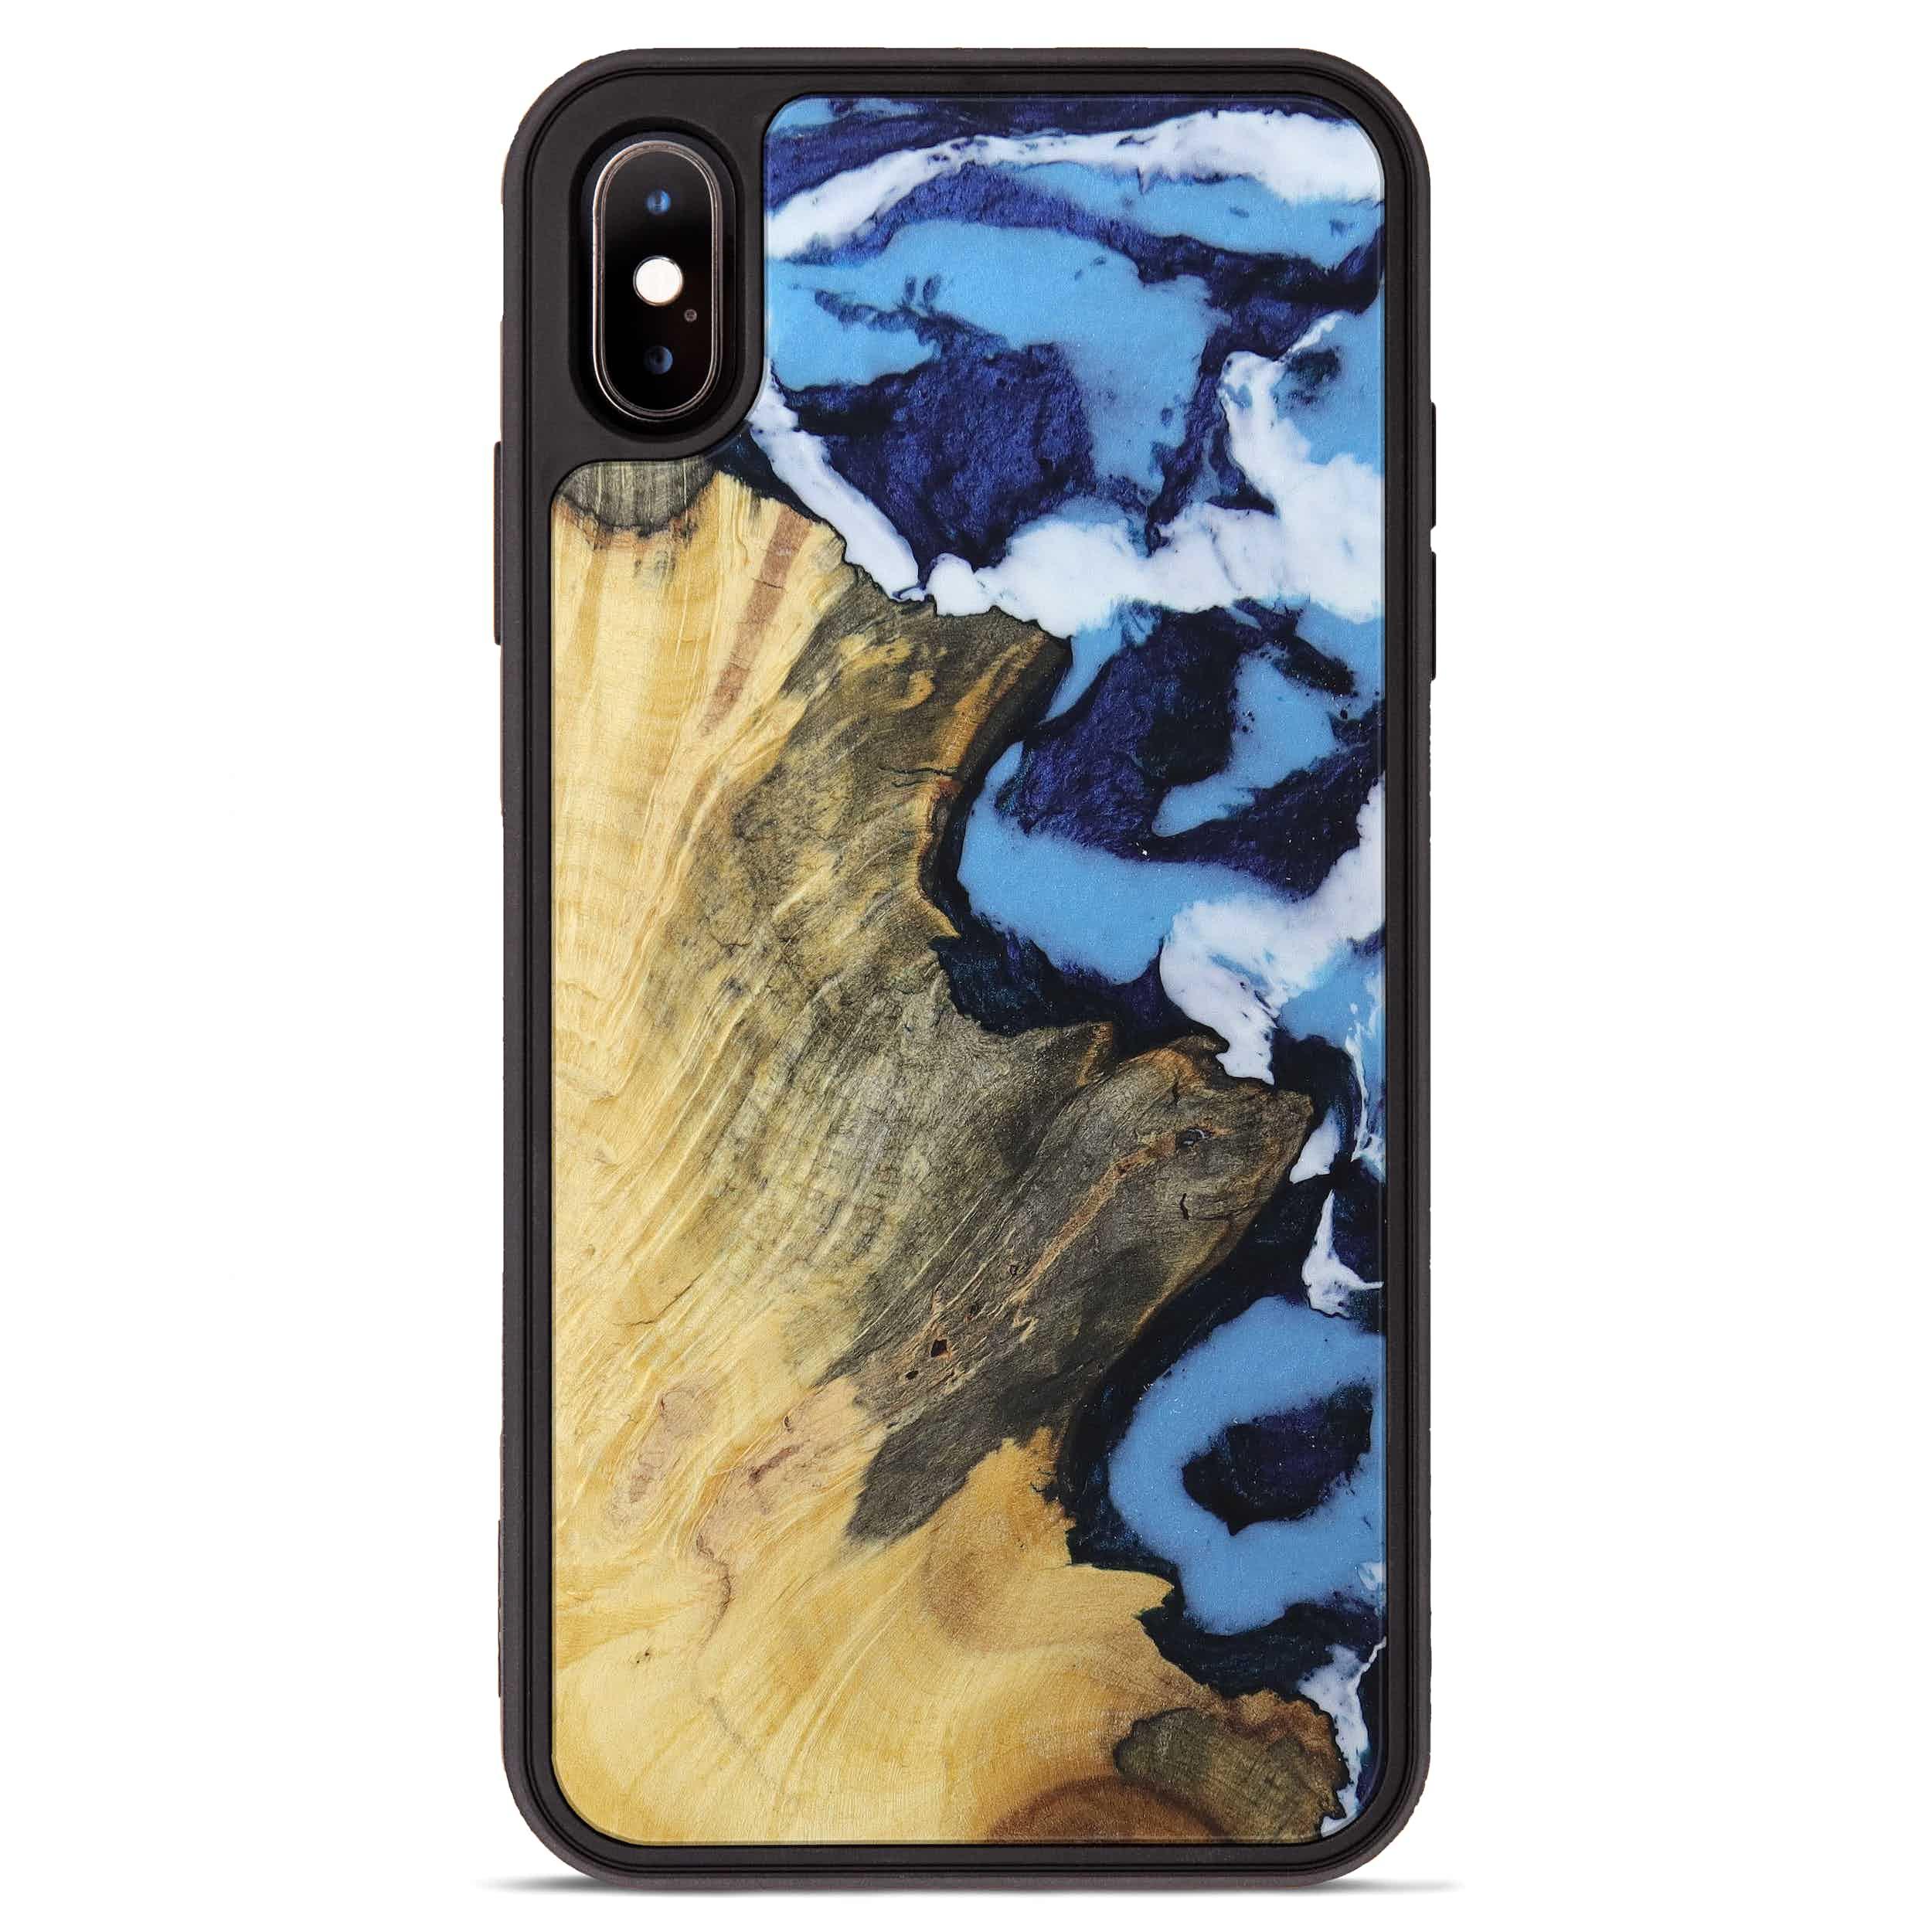 iPhone Xs Max Wood+Resin Phone Case - Ram (Dark Blue, 394640)